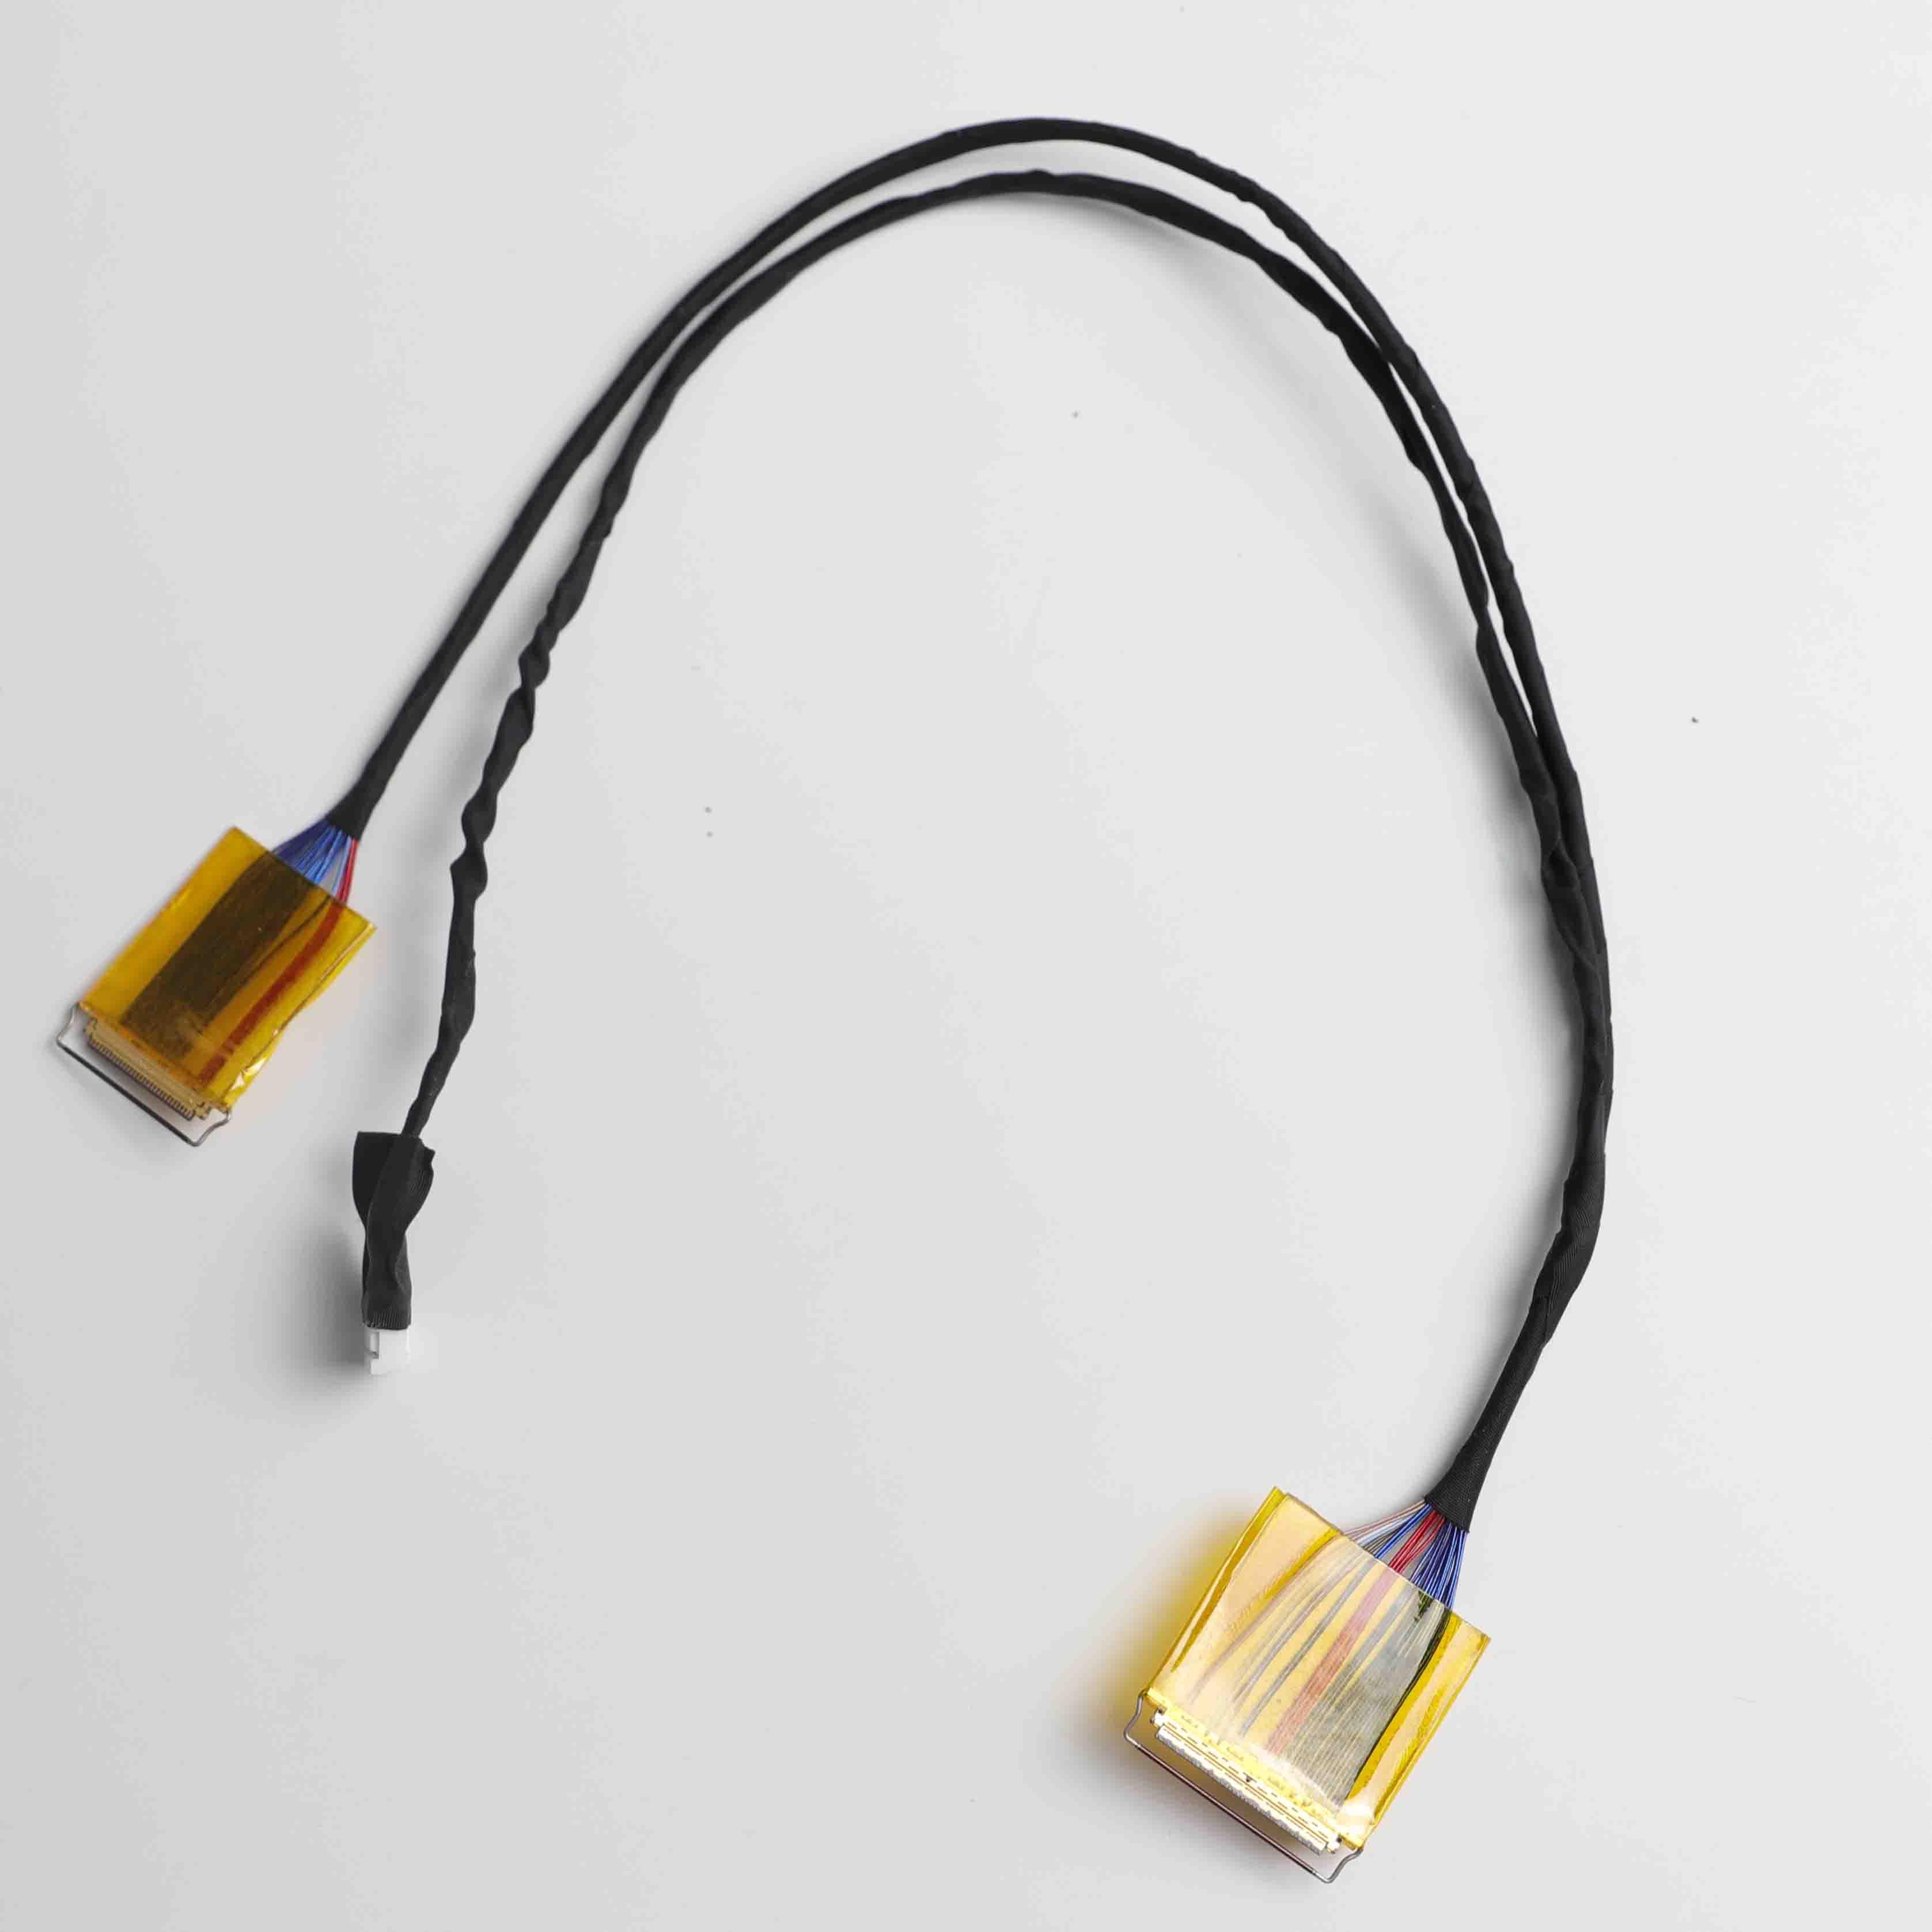 RCD-MC790 极细同轴线加工组装